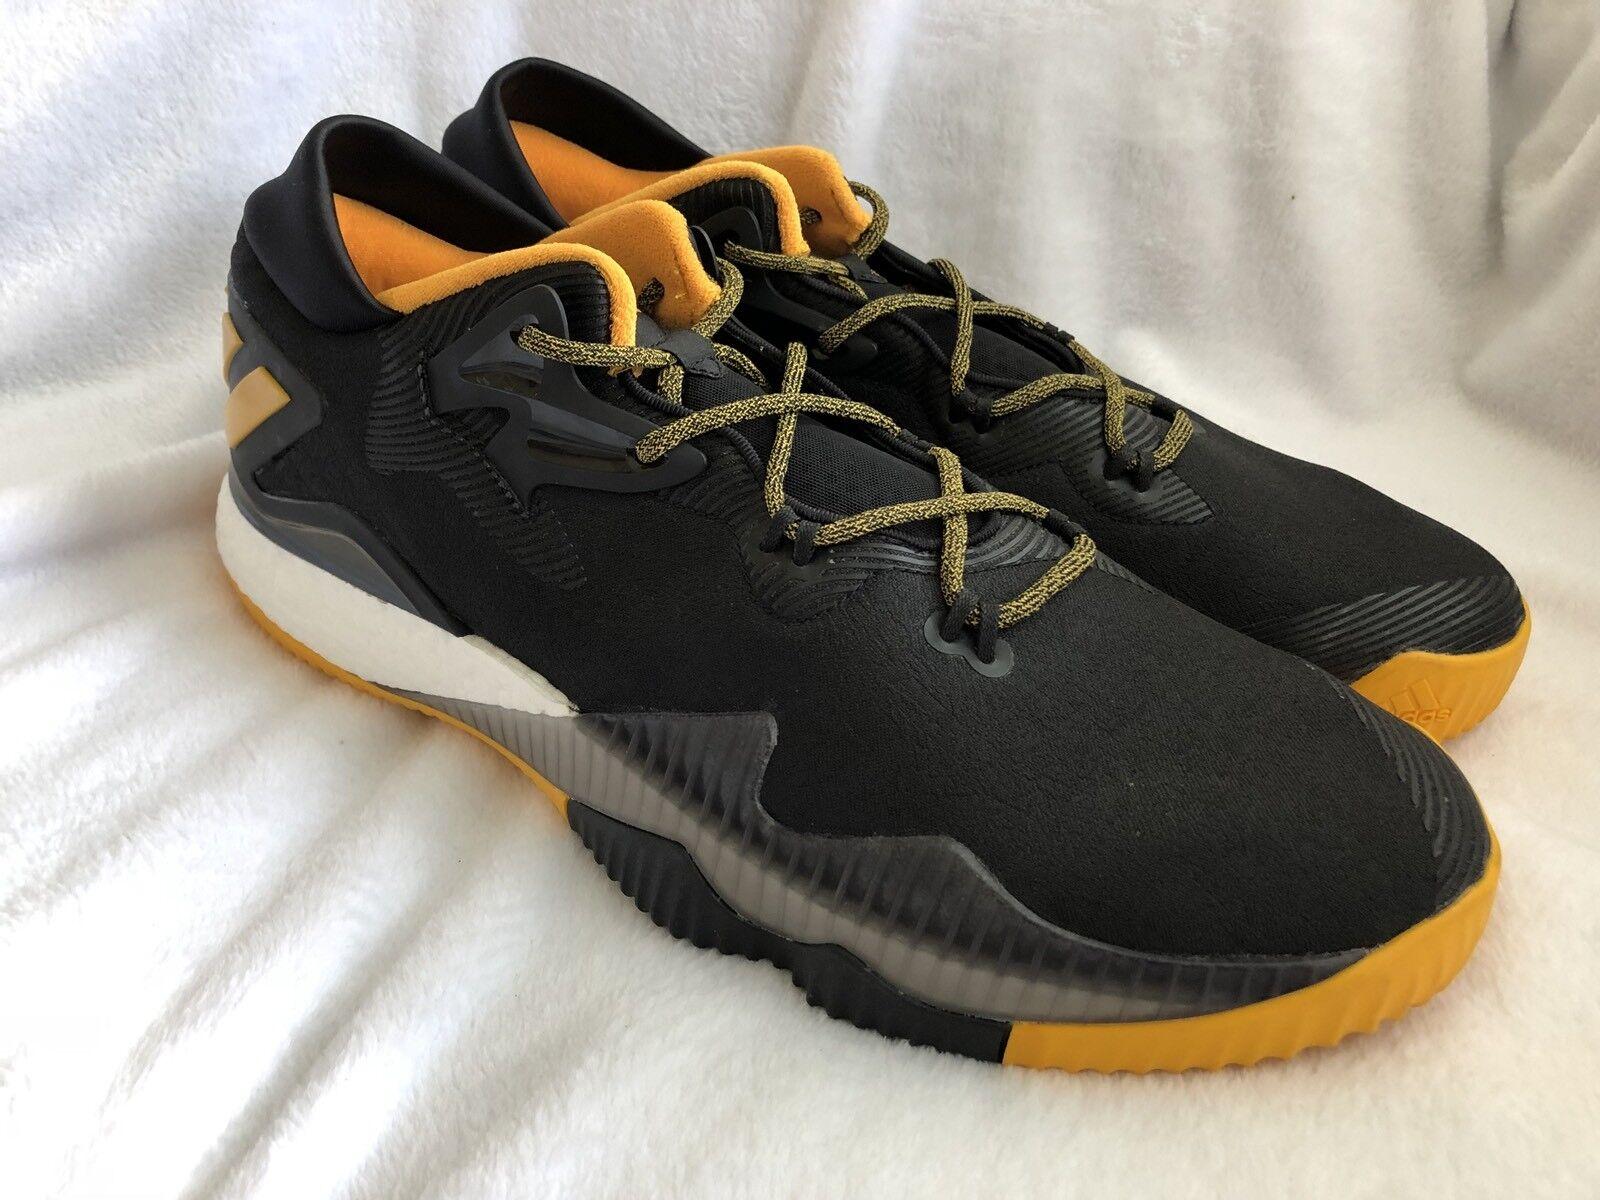 Nuovi uomini  adidas crazylight slancio basso basket 2016 b42722 scarpe da basket basso numero 19 c85a76